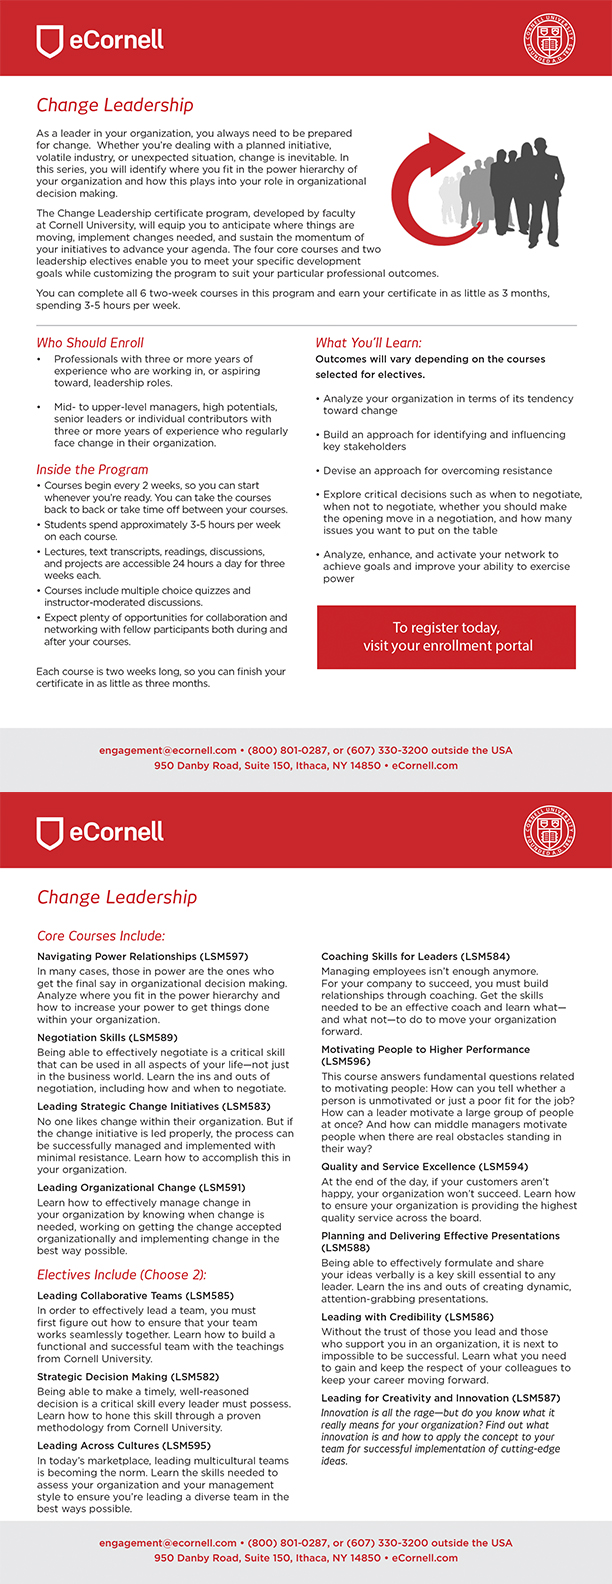 Change Leadership Flyer